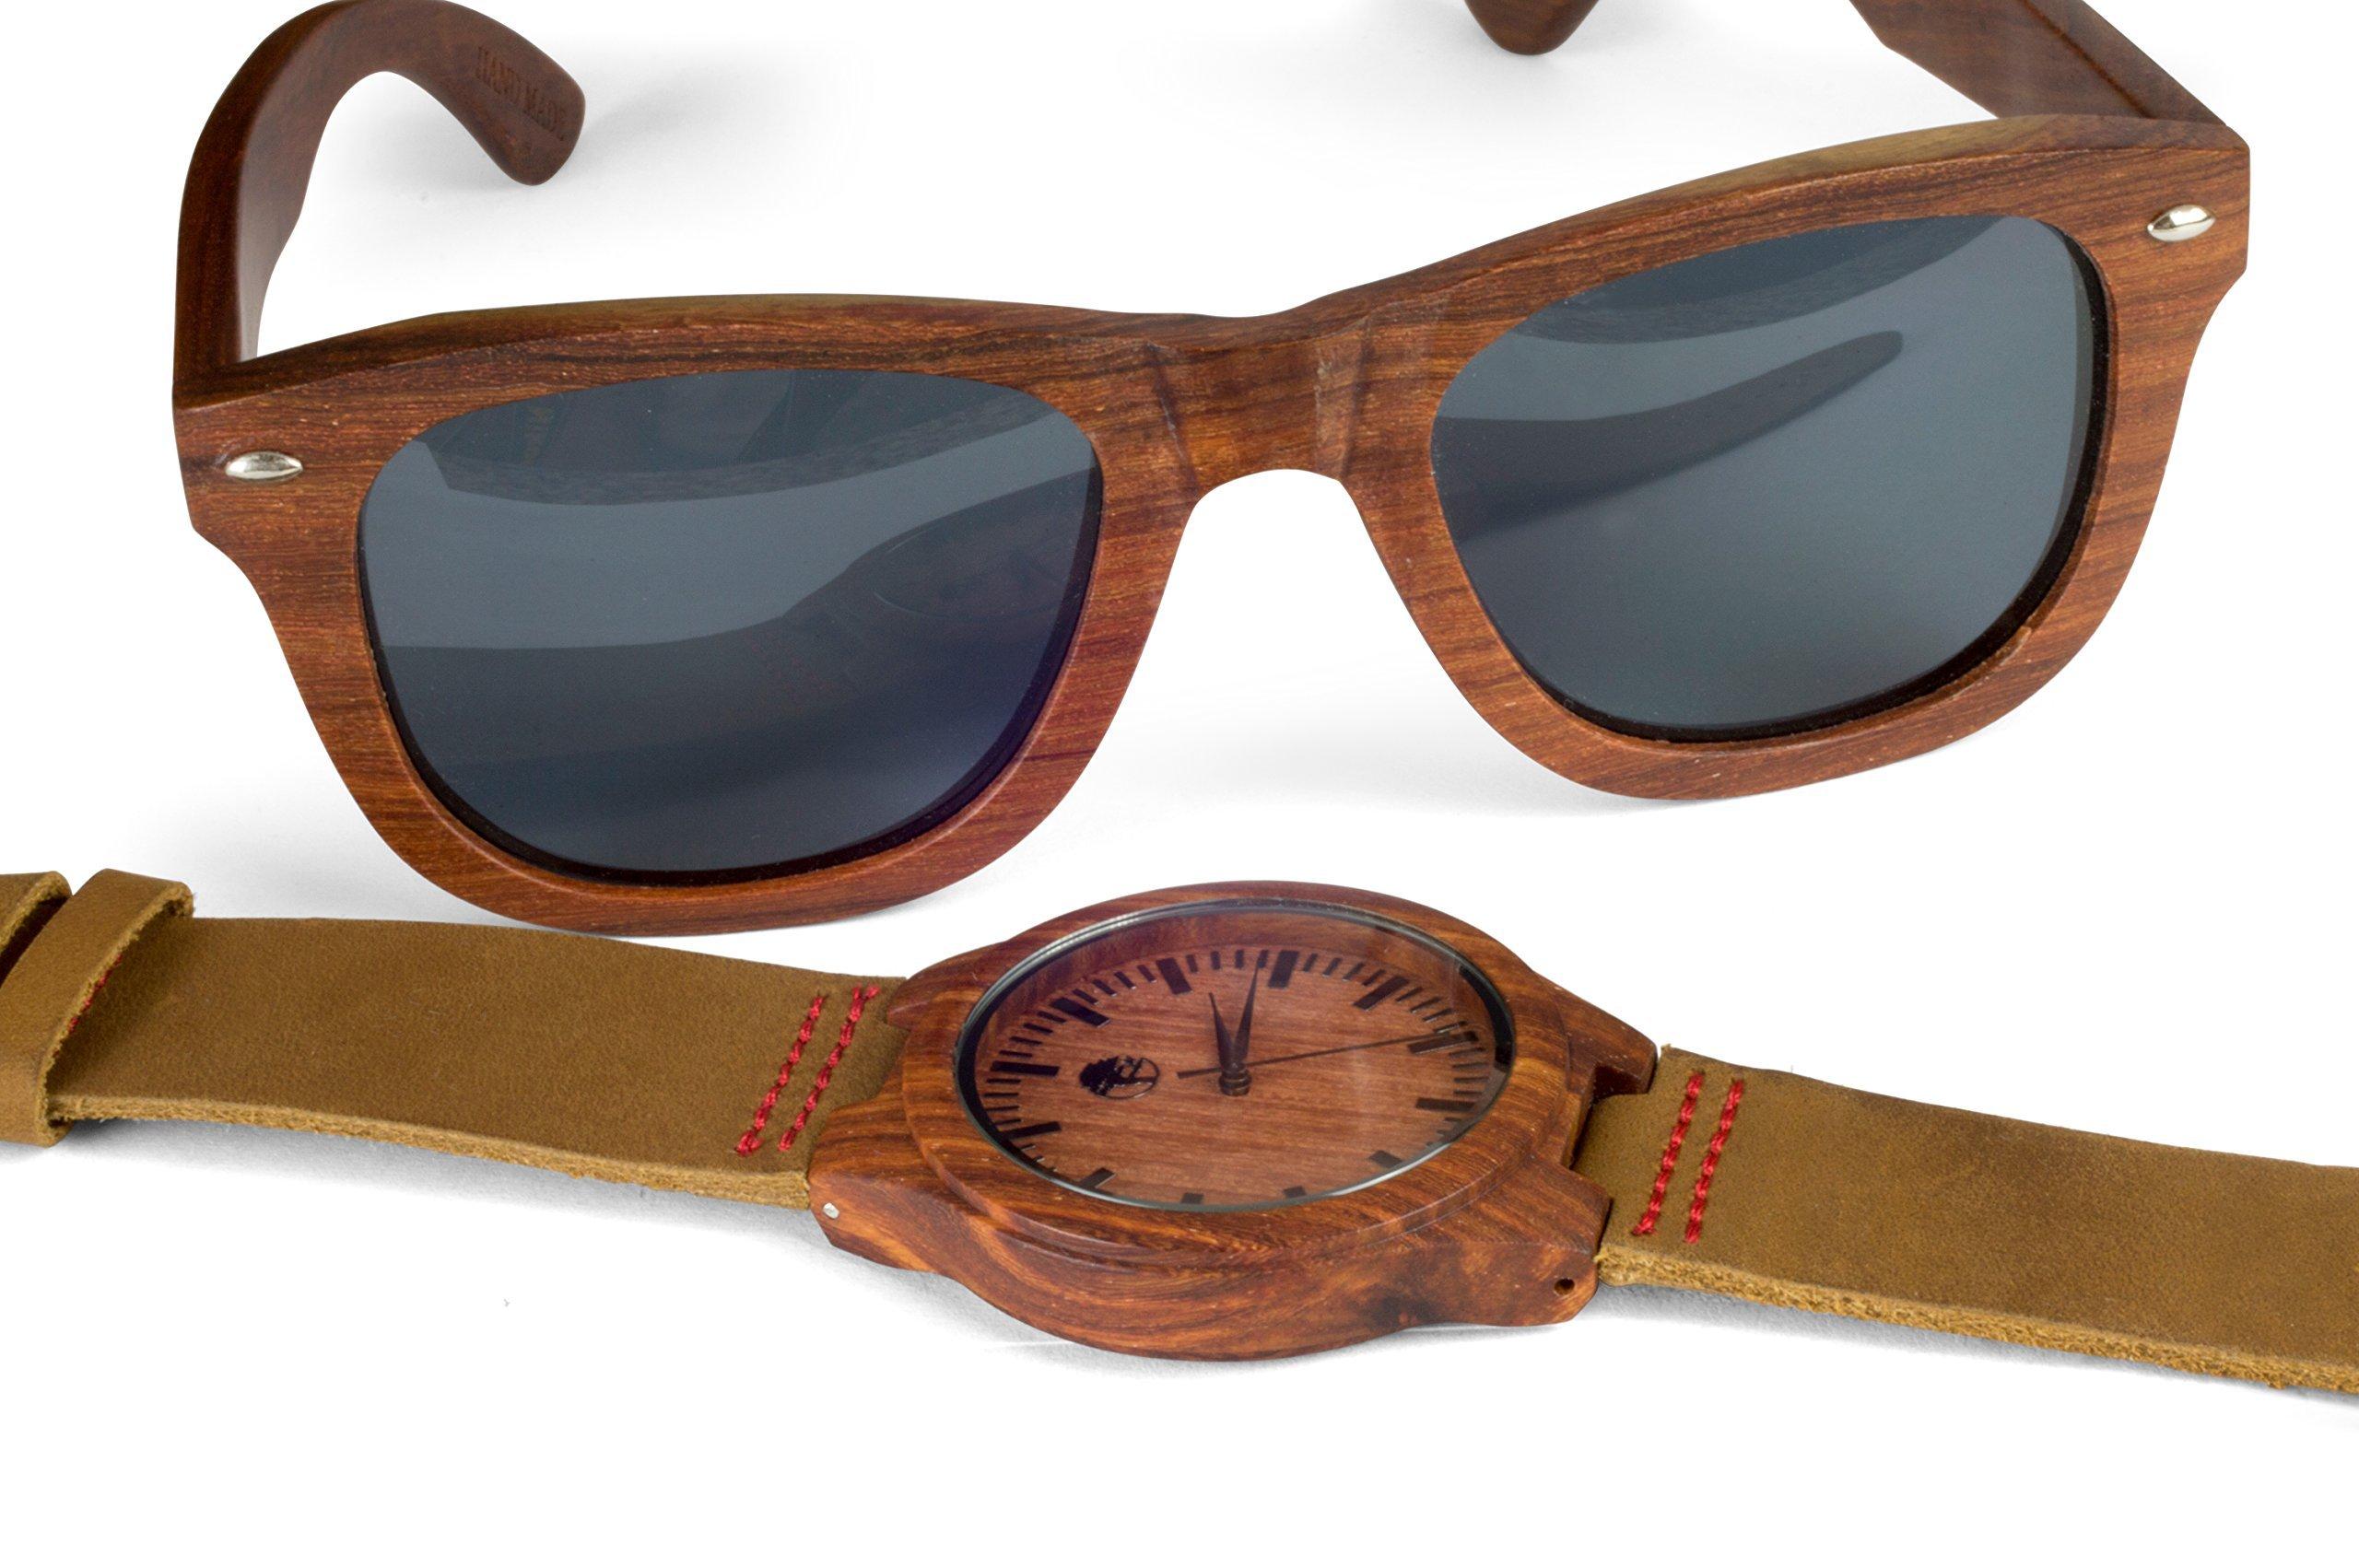 Men's Wood Watch - Wooden Sunglasses - Sandalwood Bezel - Genuine Leather - by Viable Harvest (Gift Set)